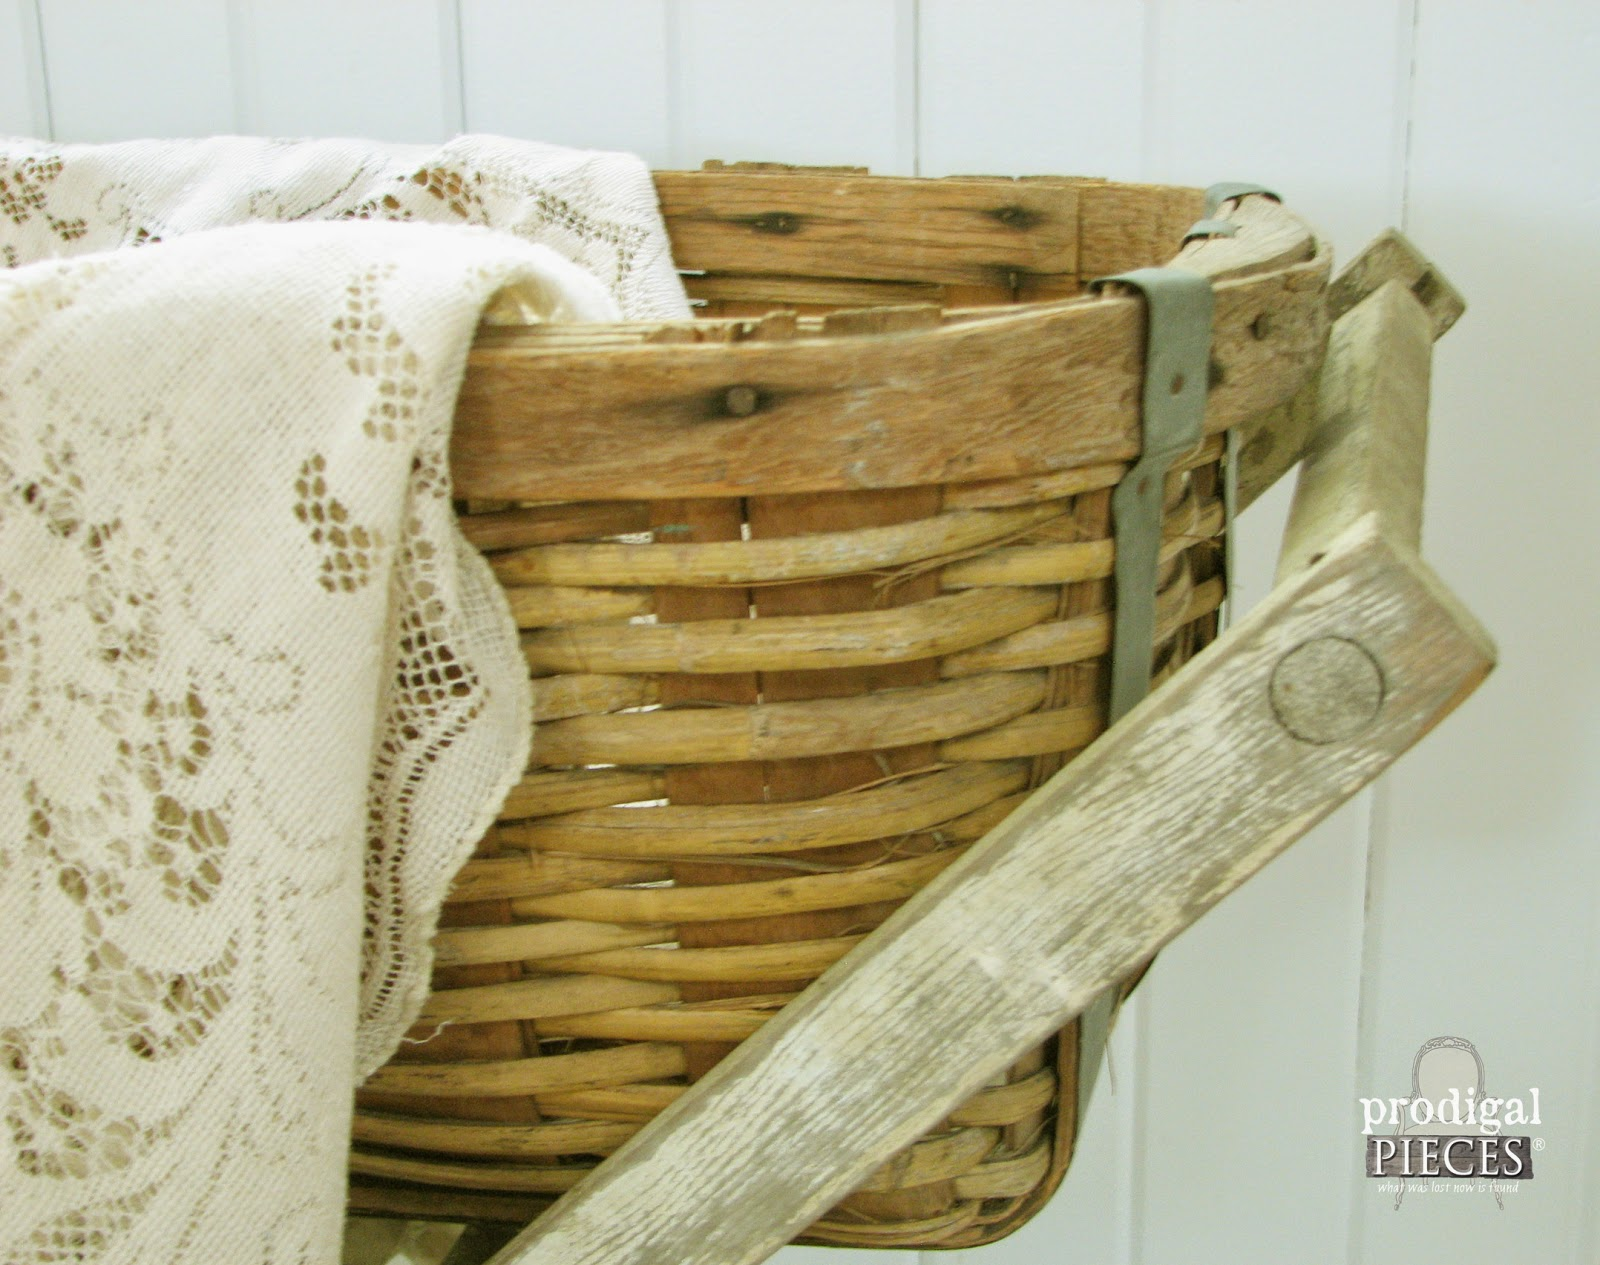 Antique Basket Laundry Cart by Prodigal Pieces http://www.prodigalpieces.com